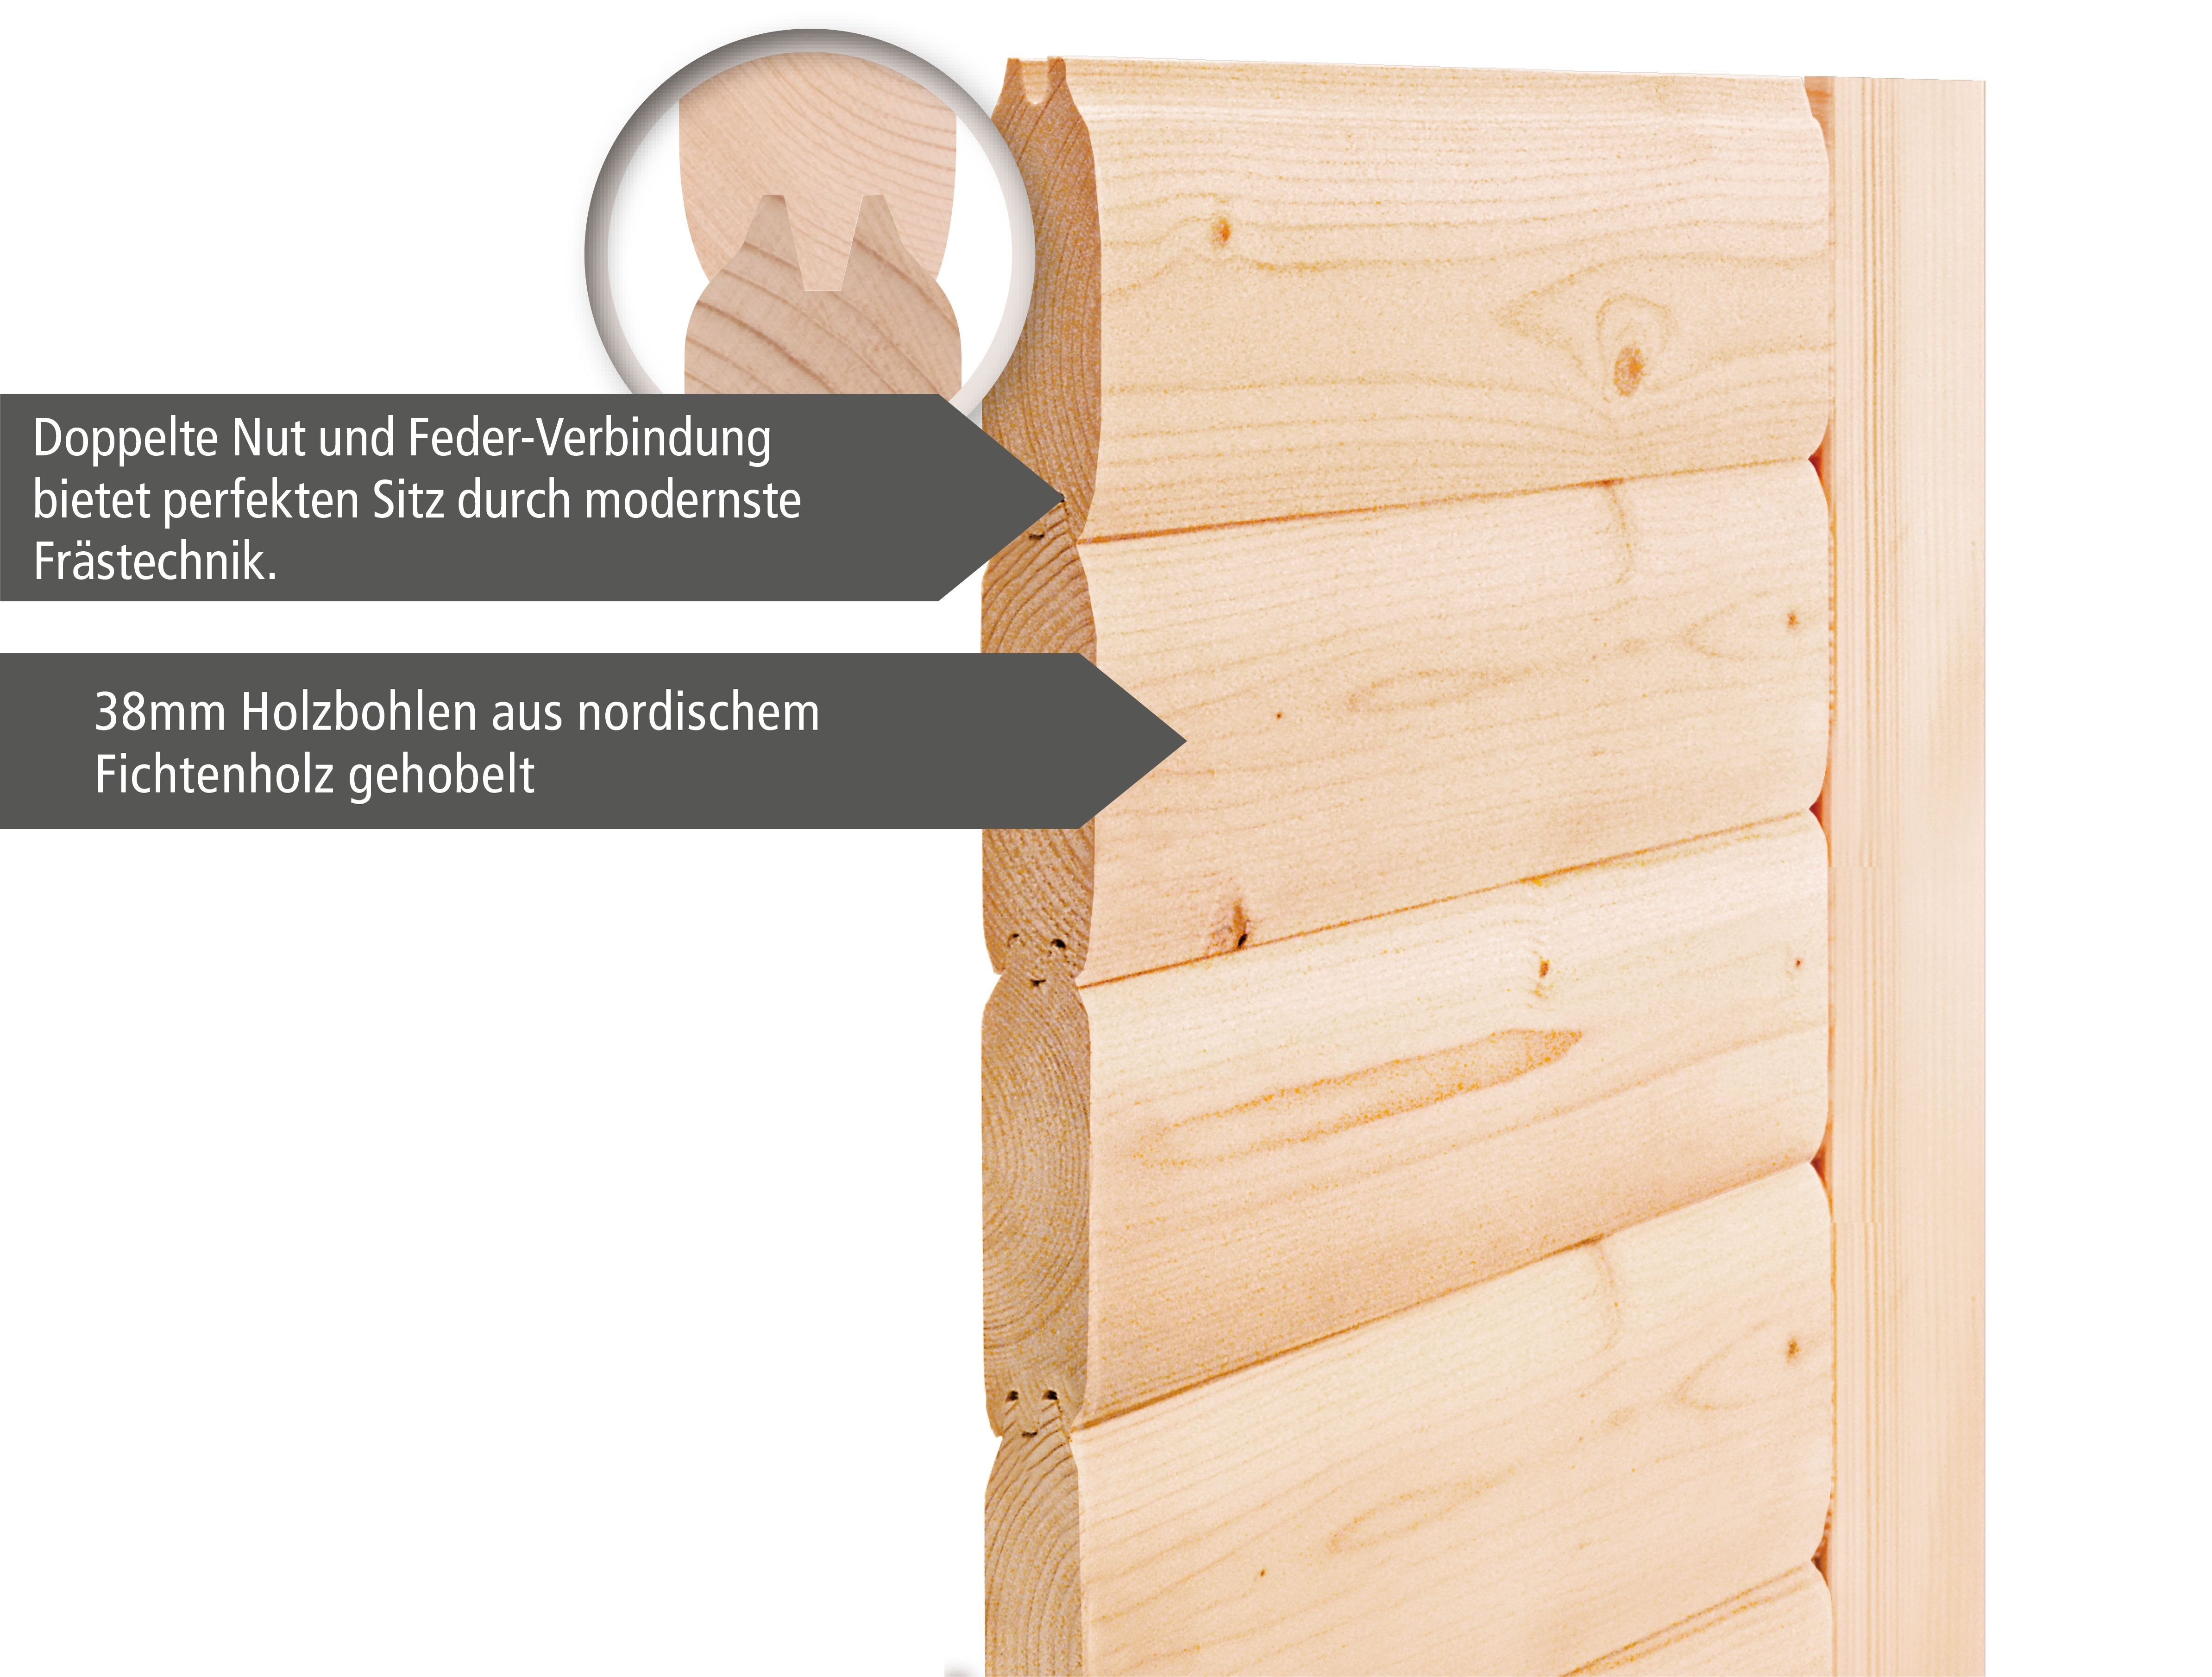 Woodfeeling Sauna Jara 38mm Dachkranz Saunaofen 9 kW extern Bild 5